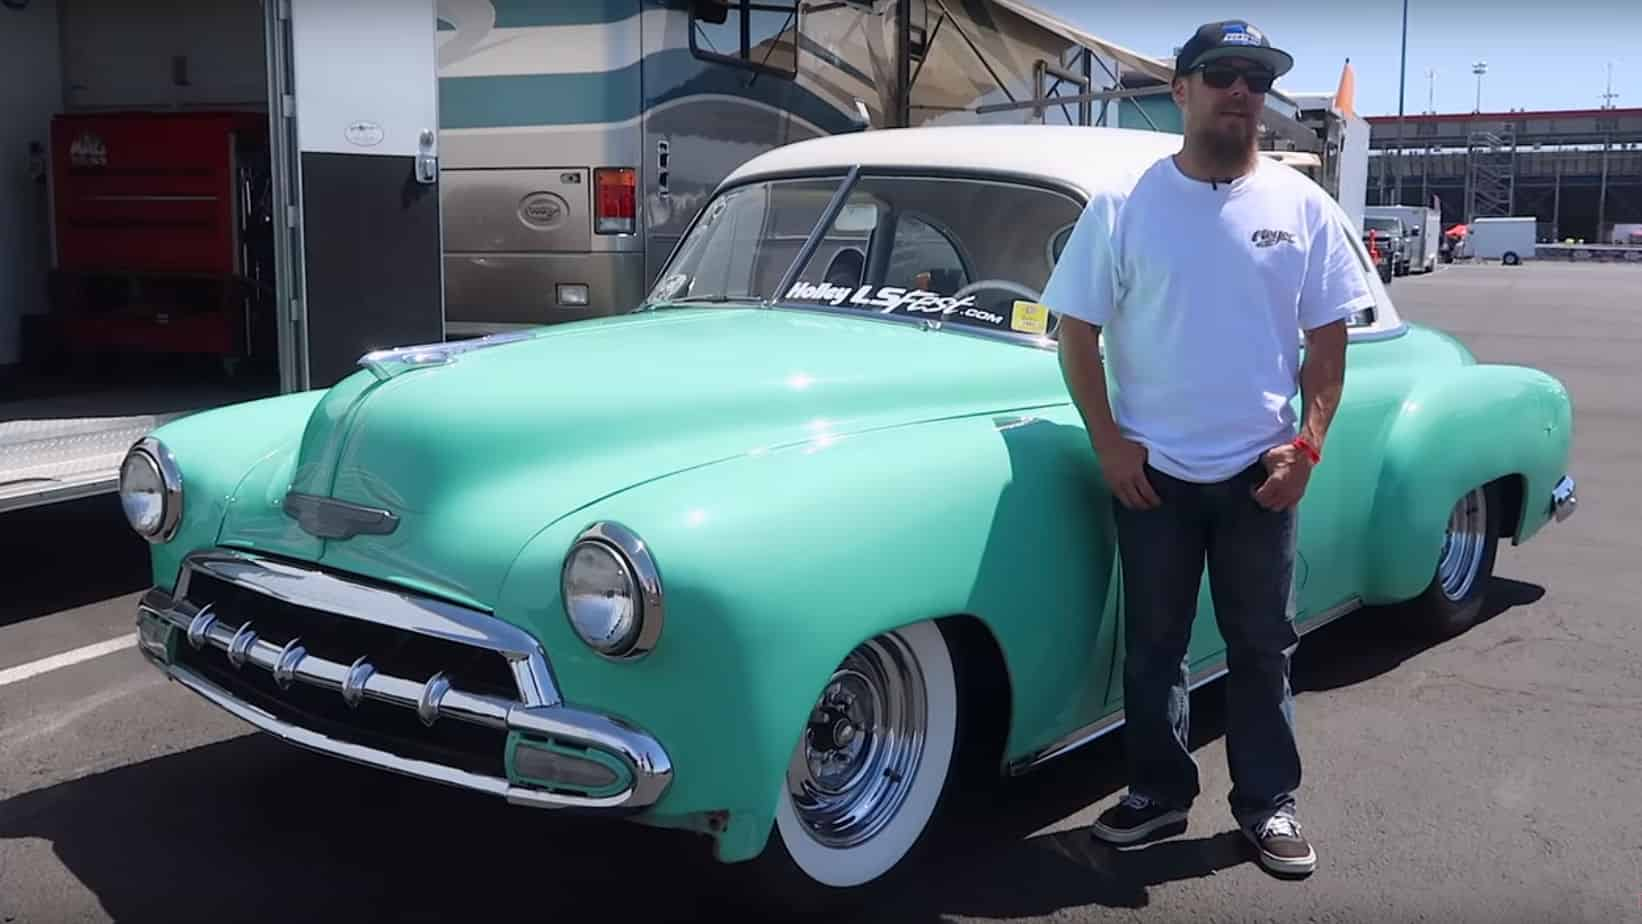 1952 Chevrolet Sedan I Built It To Drive